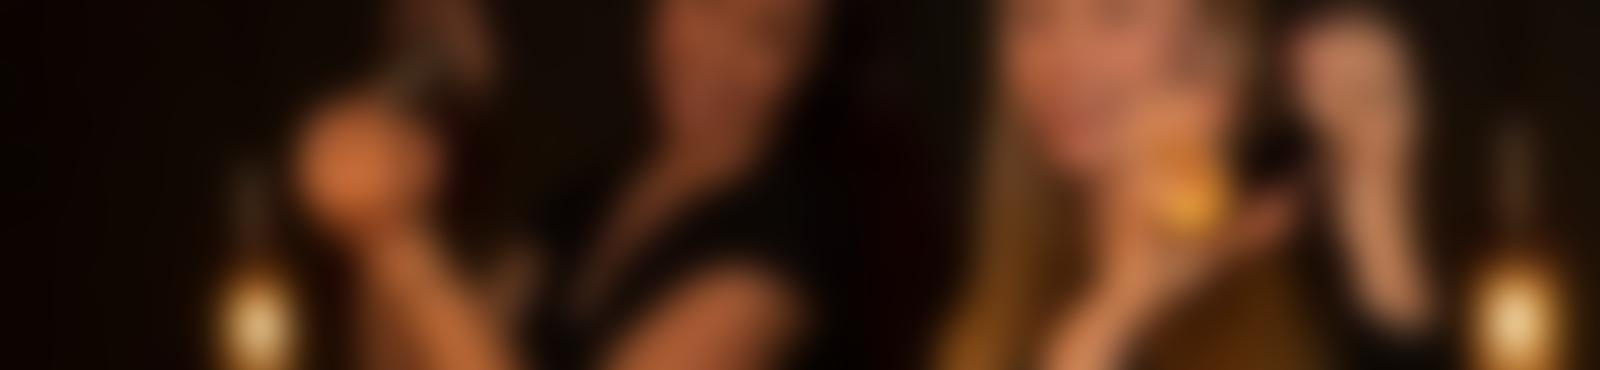 Blurred b33f8889 4290 41d2 a9a5 af27639d9717